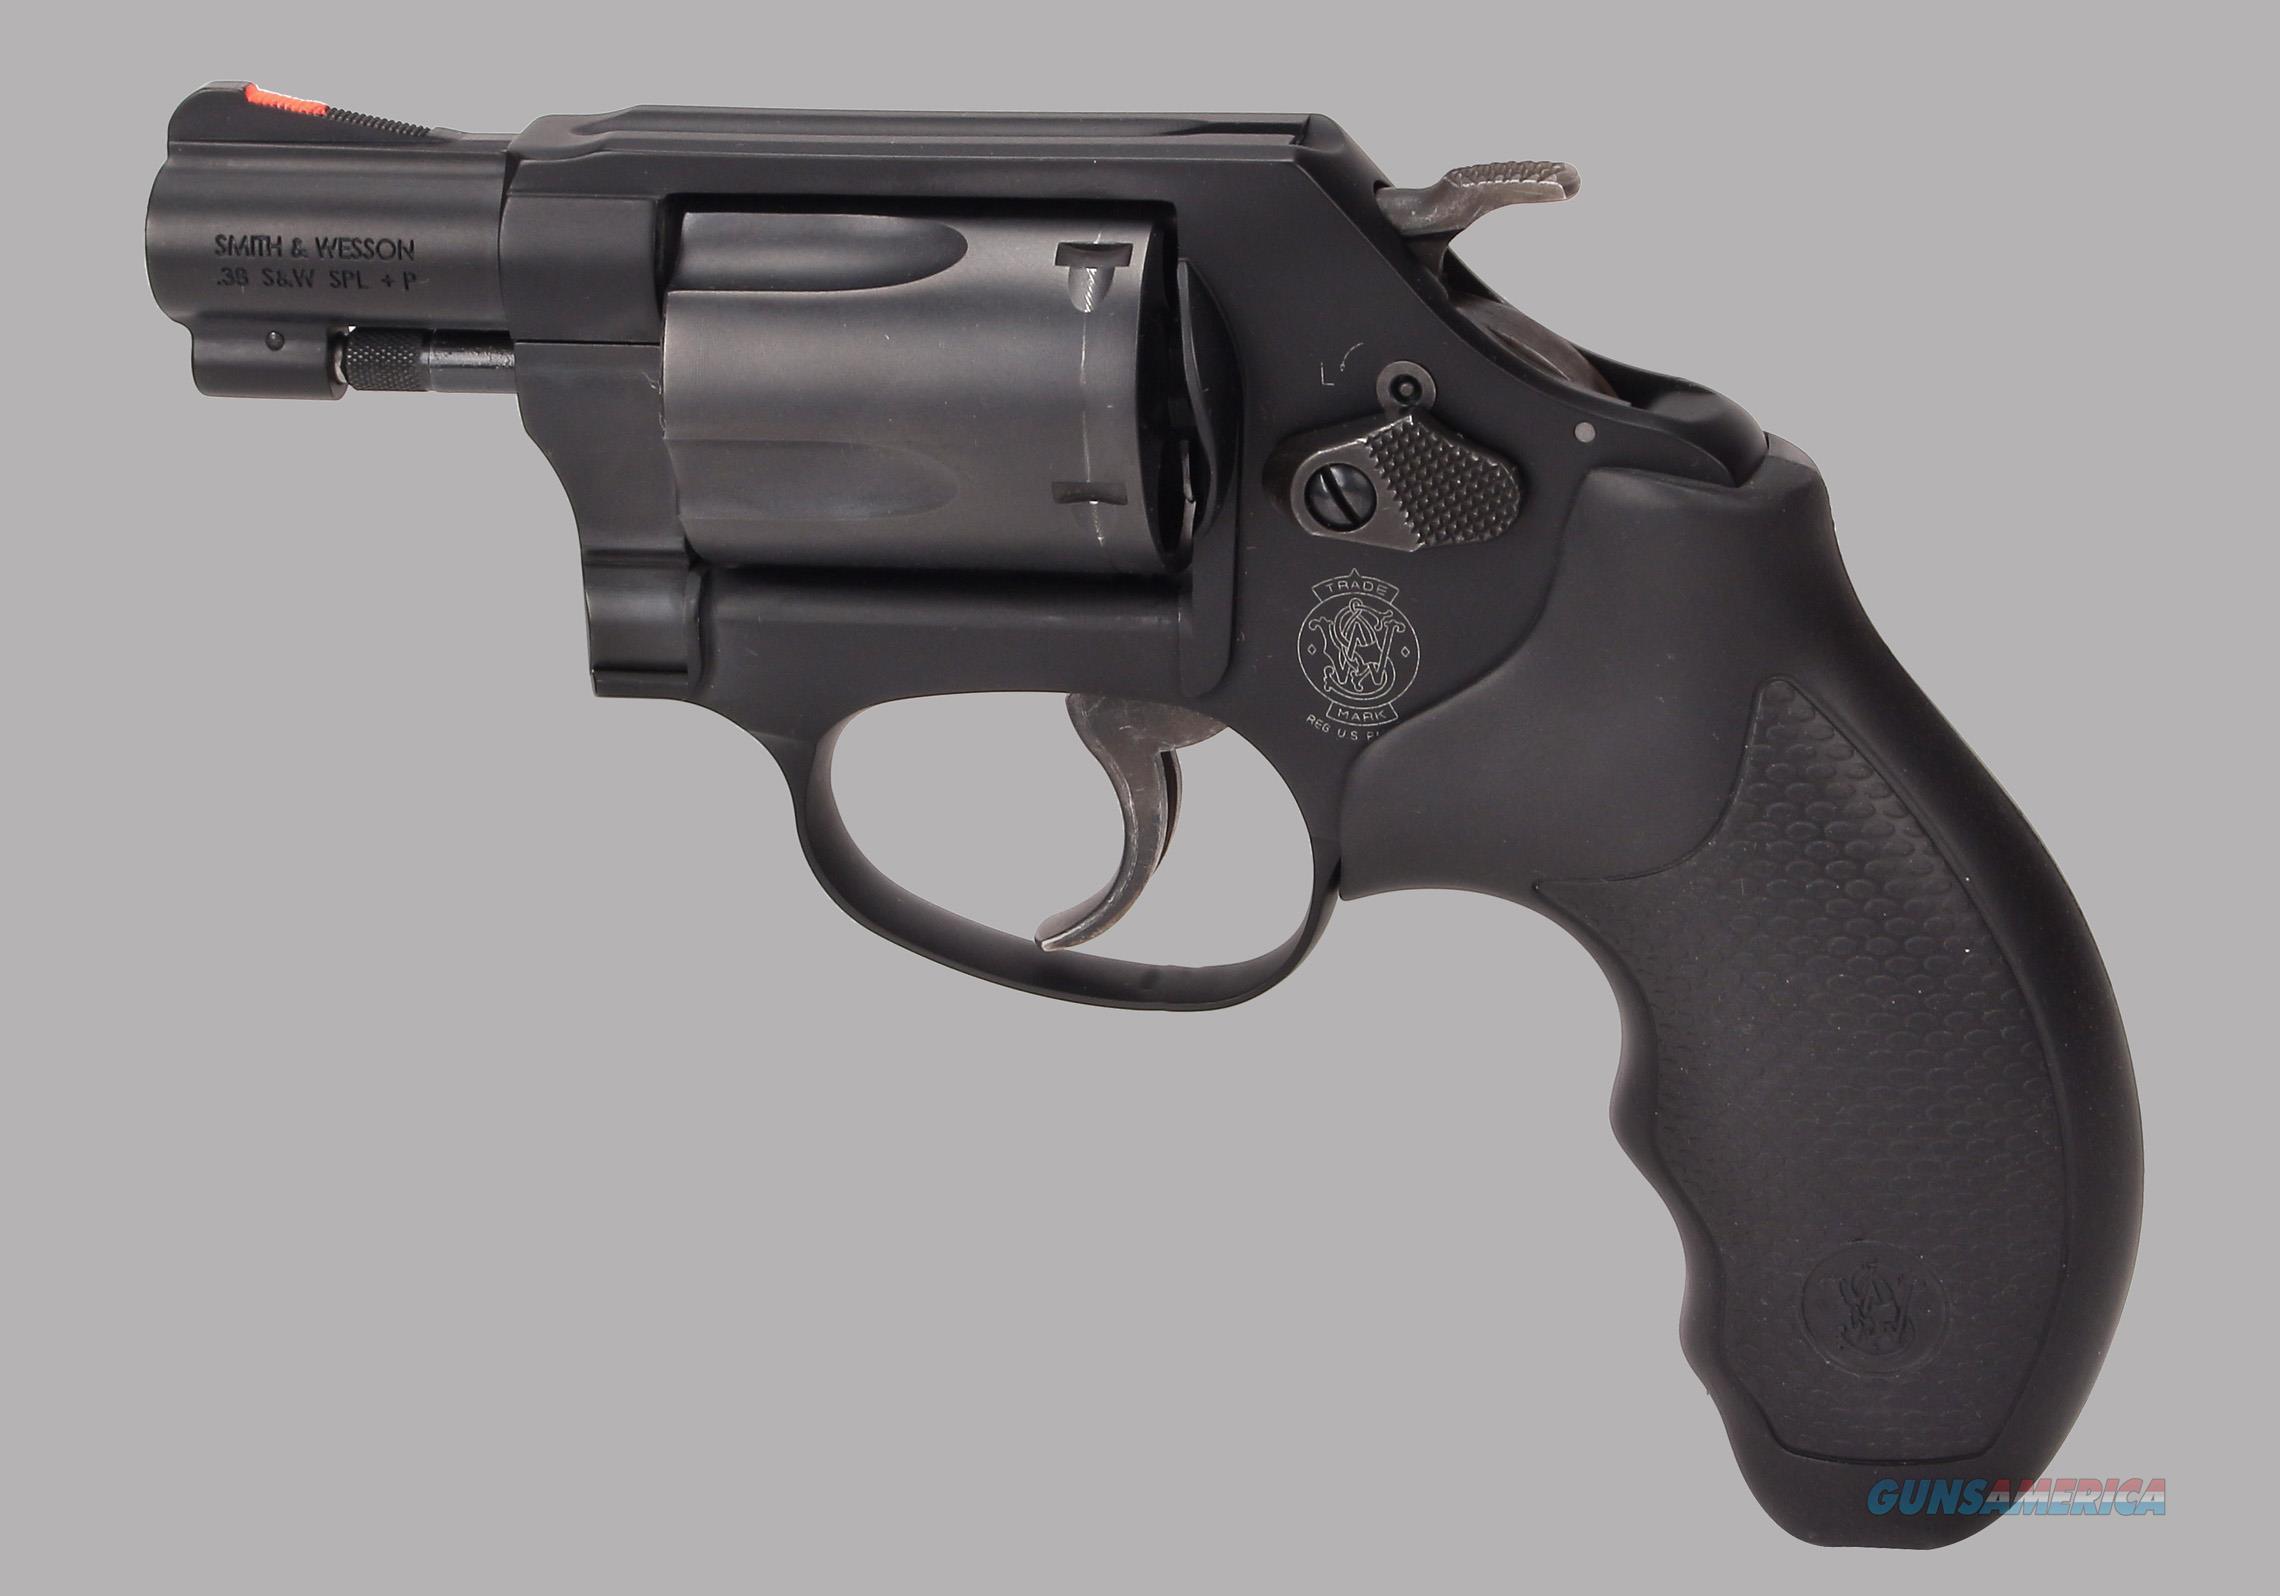 Smith & Wesson Model 437 Revolver